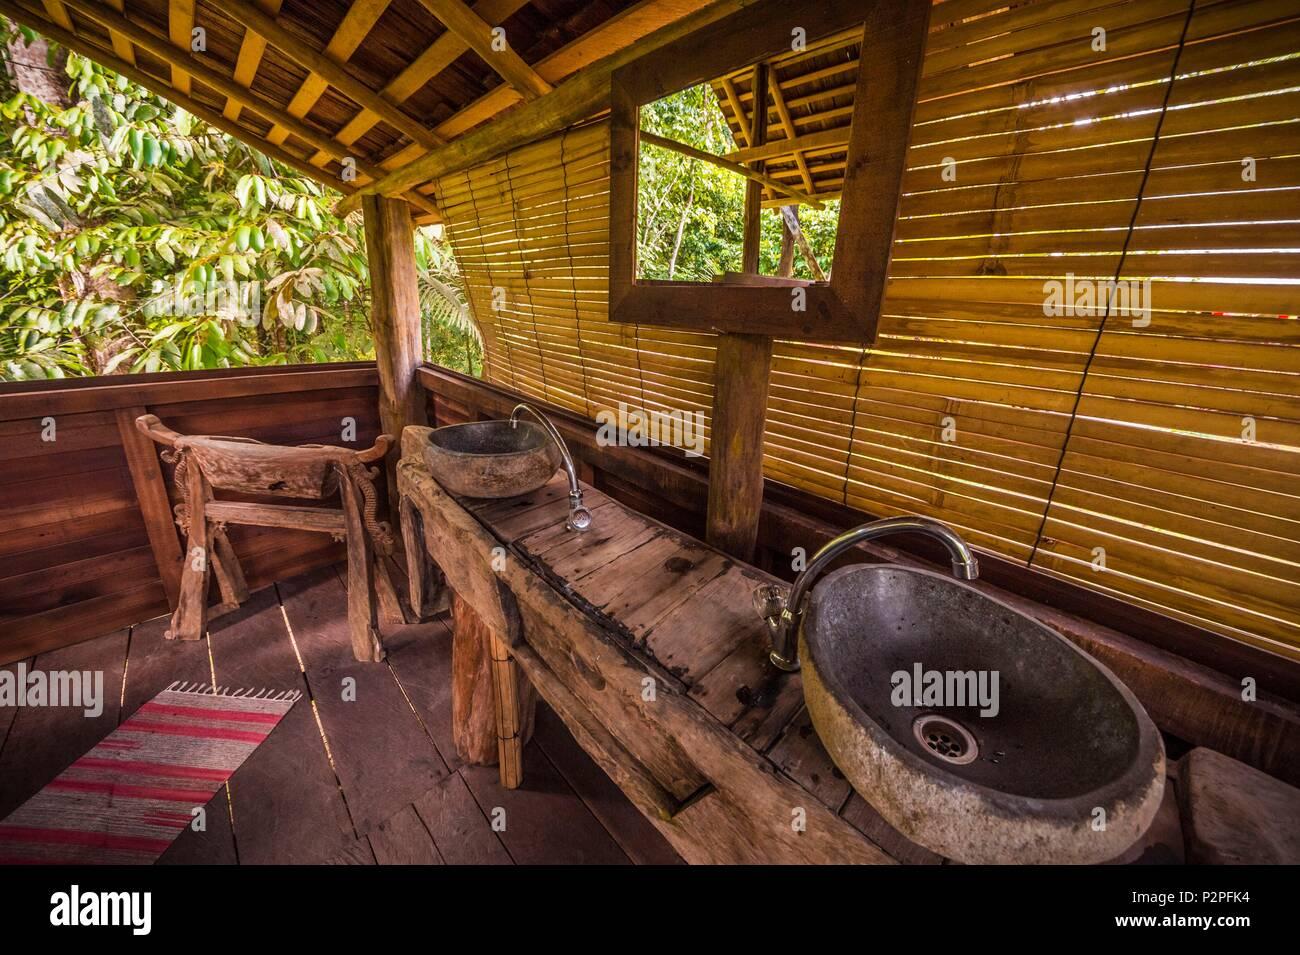 Meuble Salle De Bain Action ~ wapa lodge photos wapa lodge images alamy